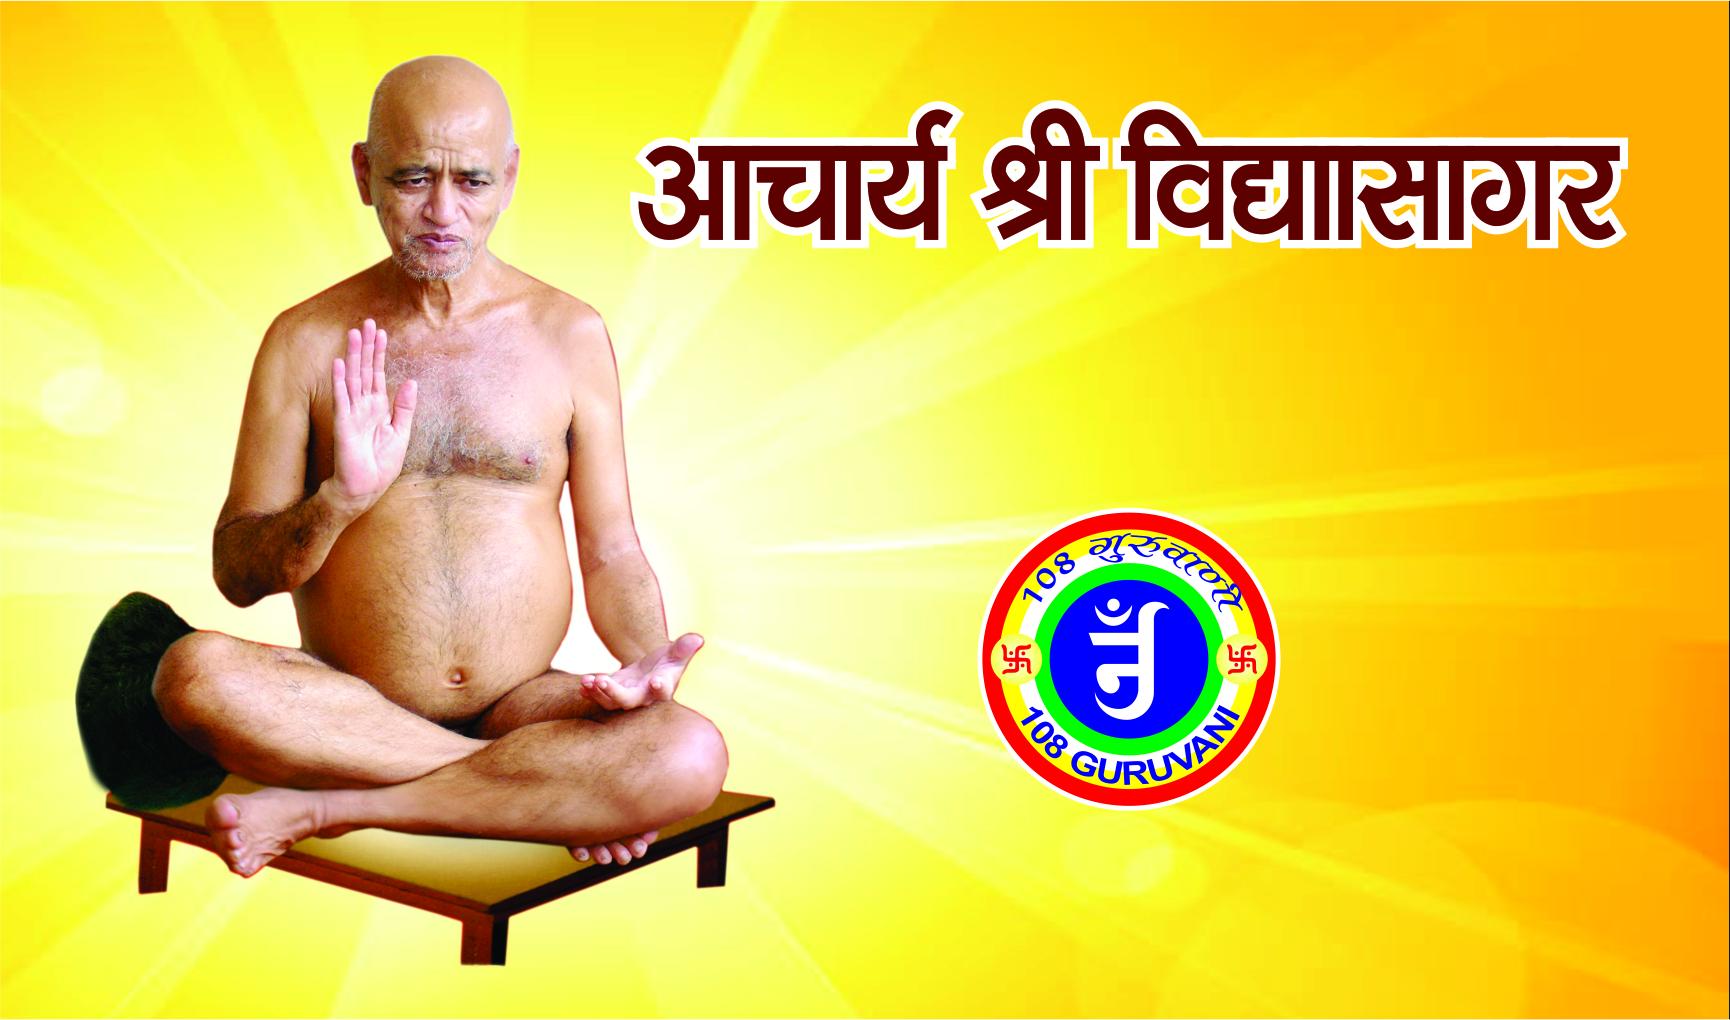 108 guruvani banner 1